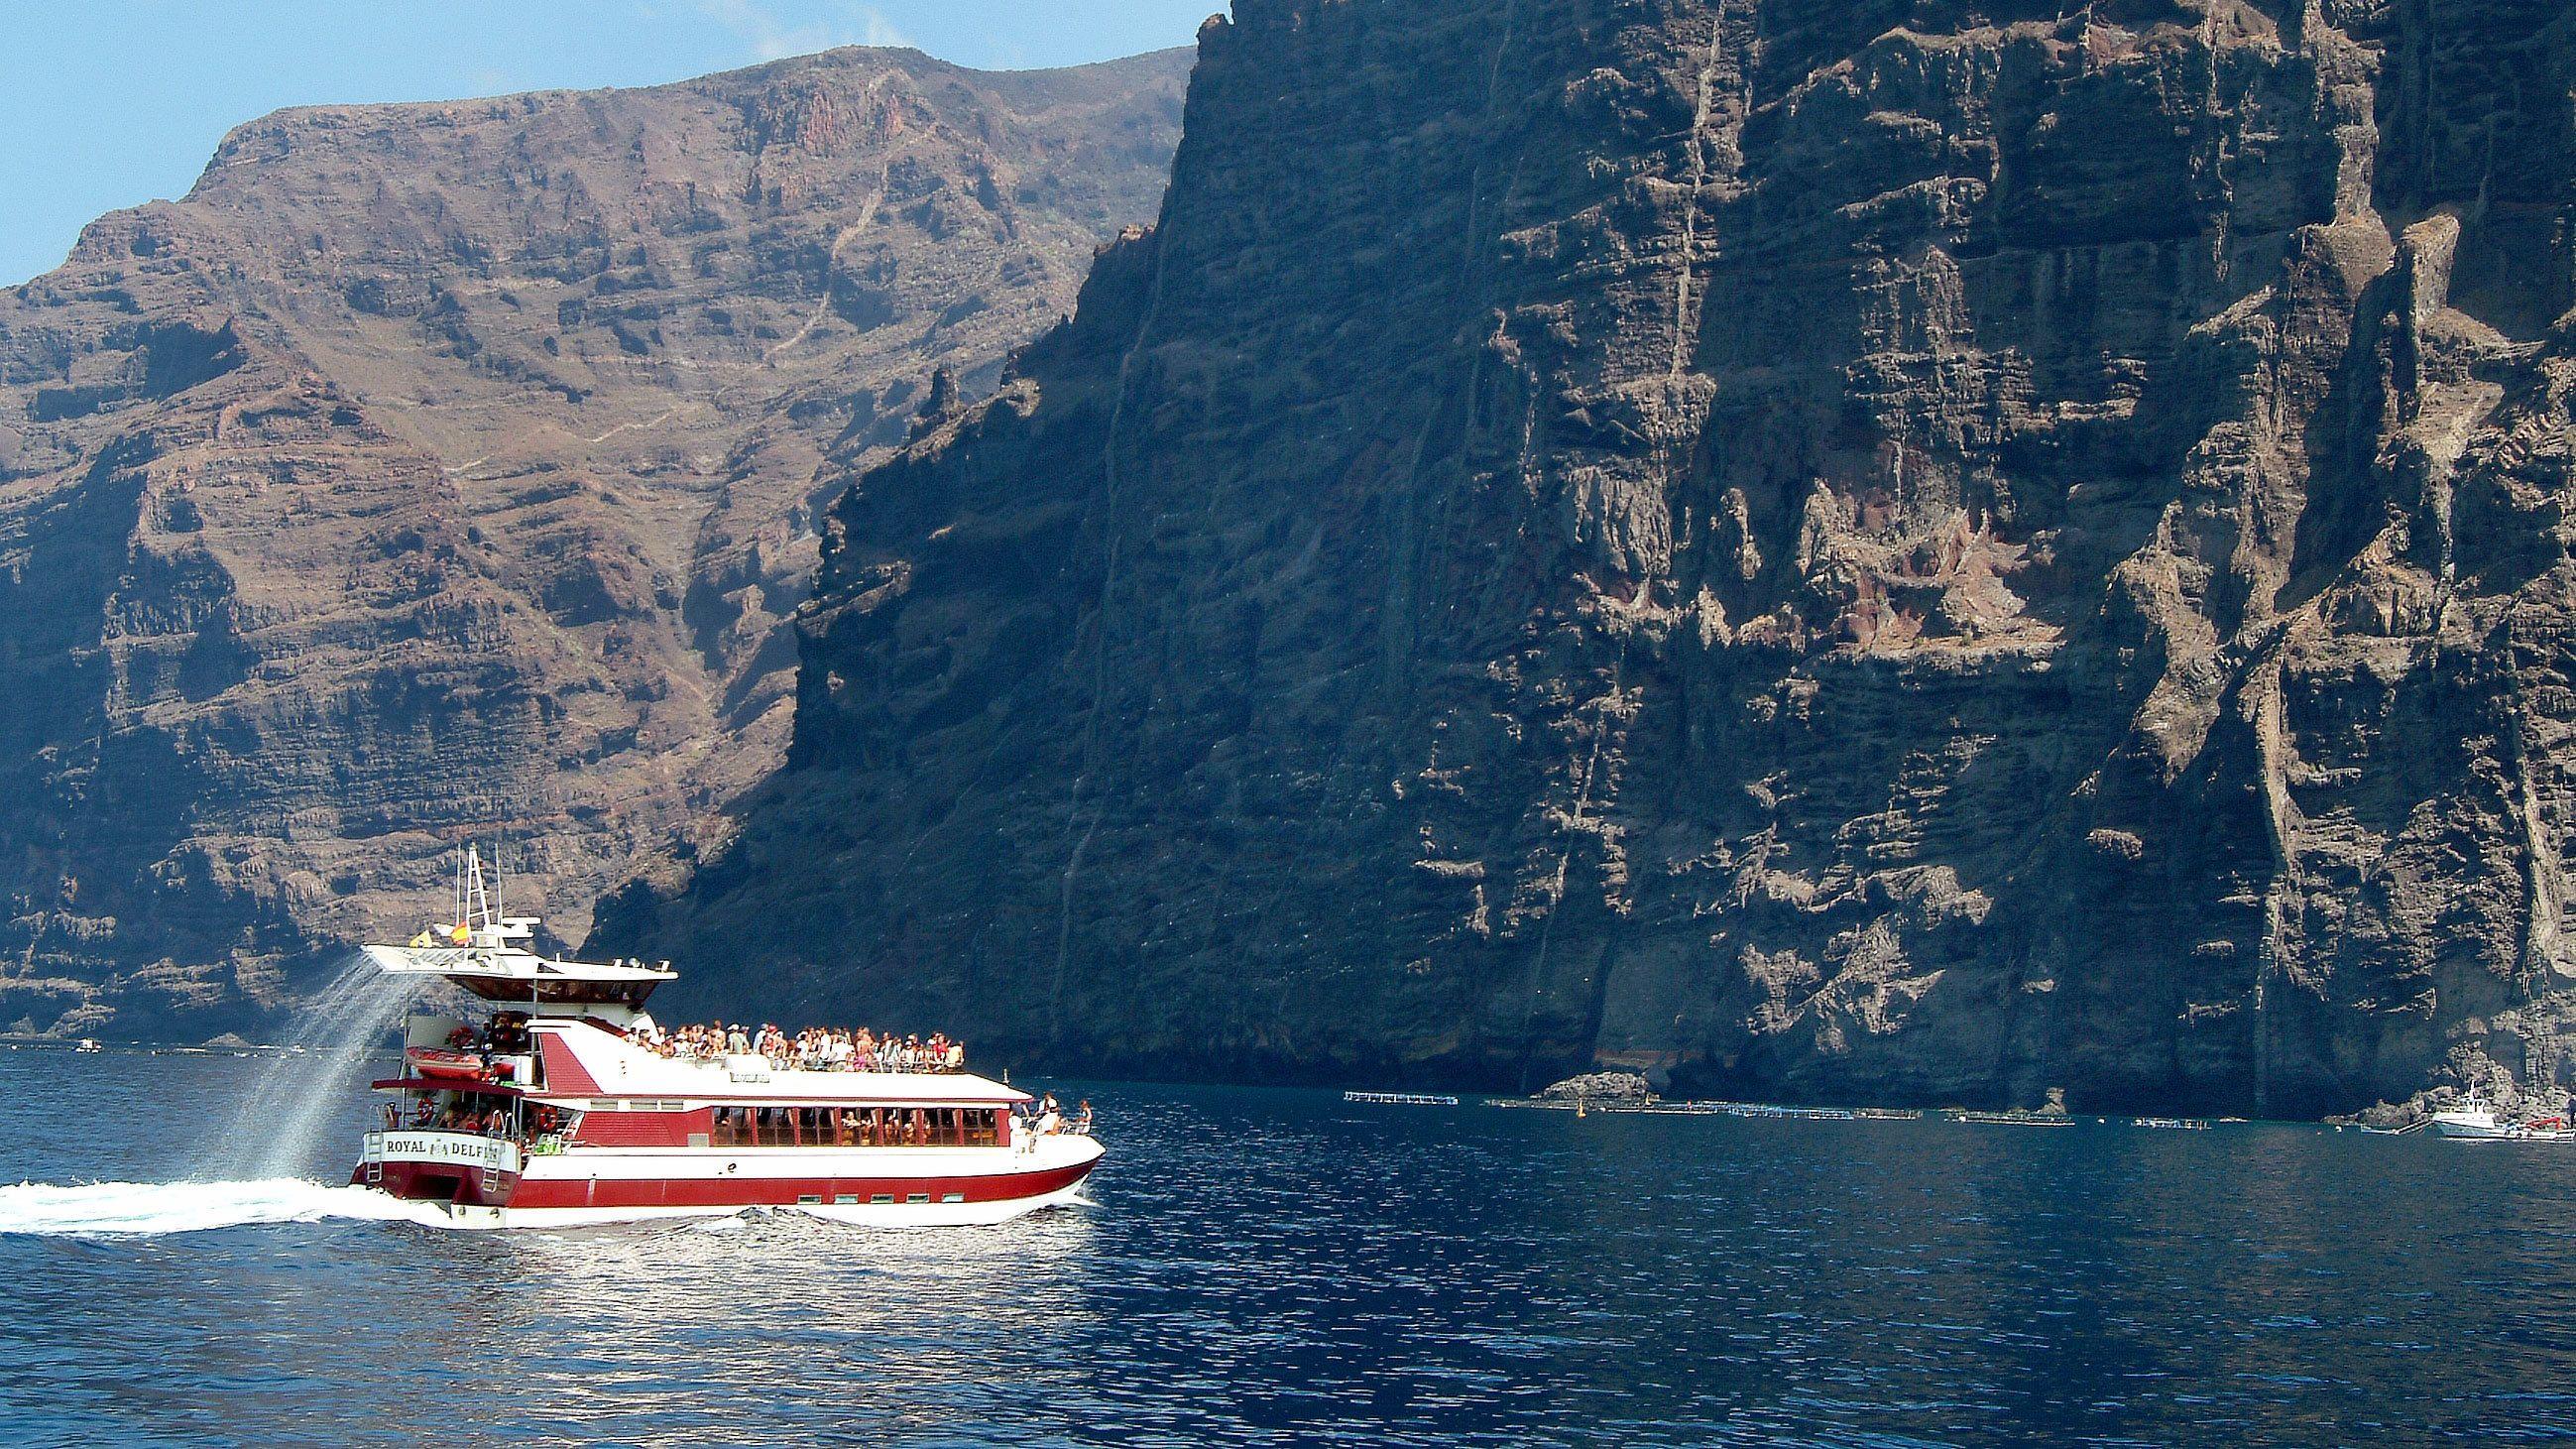 Double decker boat touring around Tenerife's coast